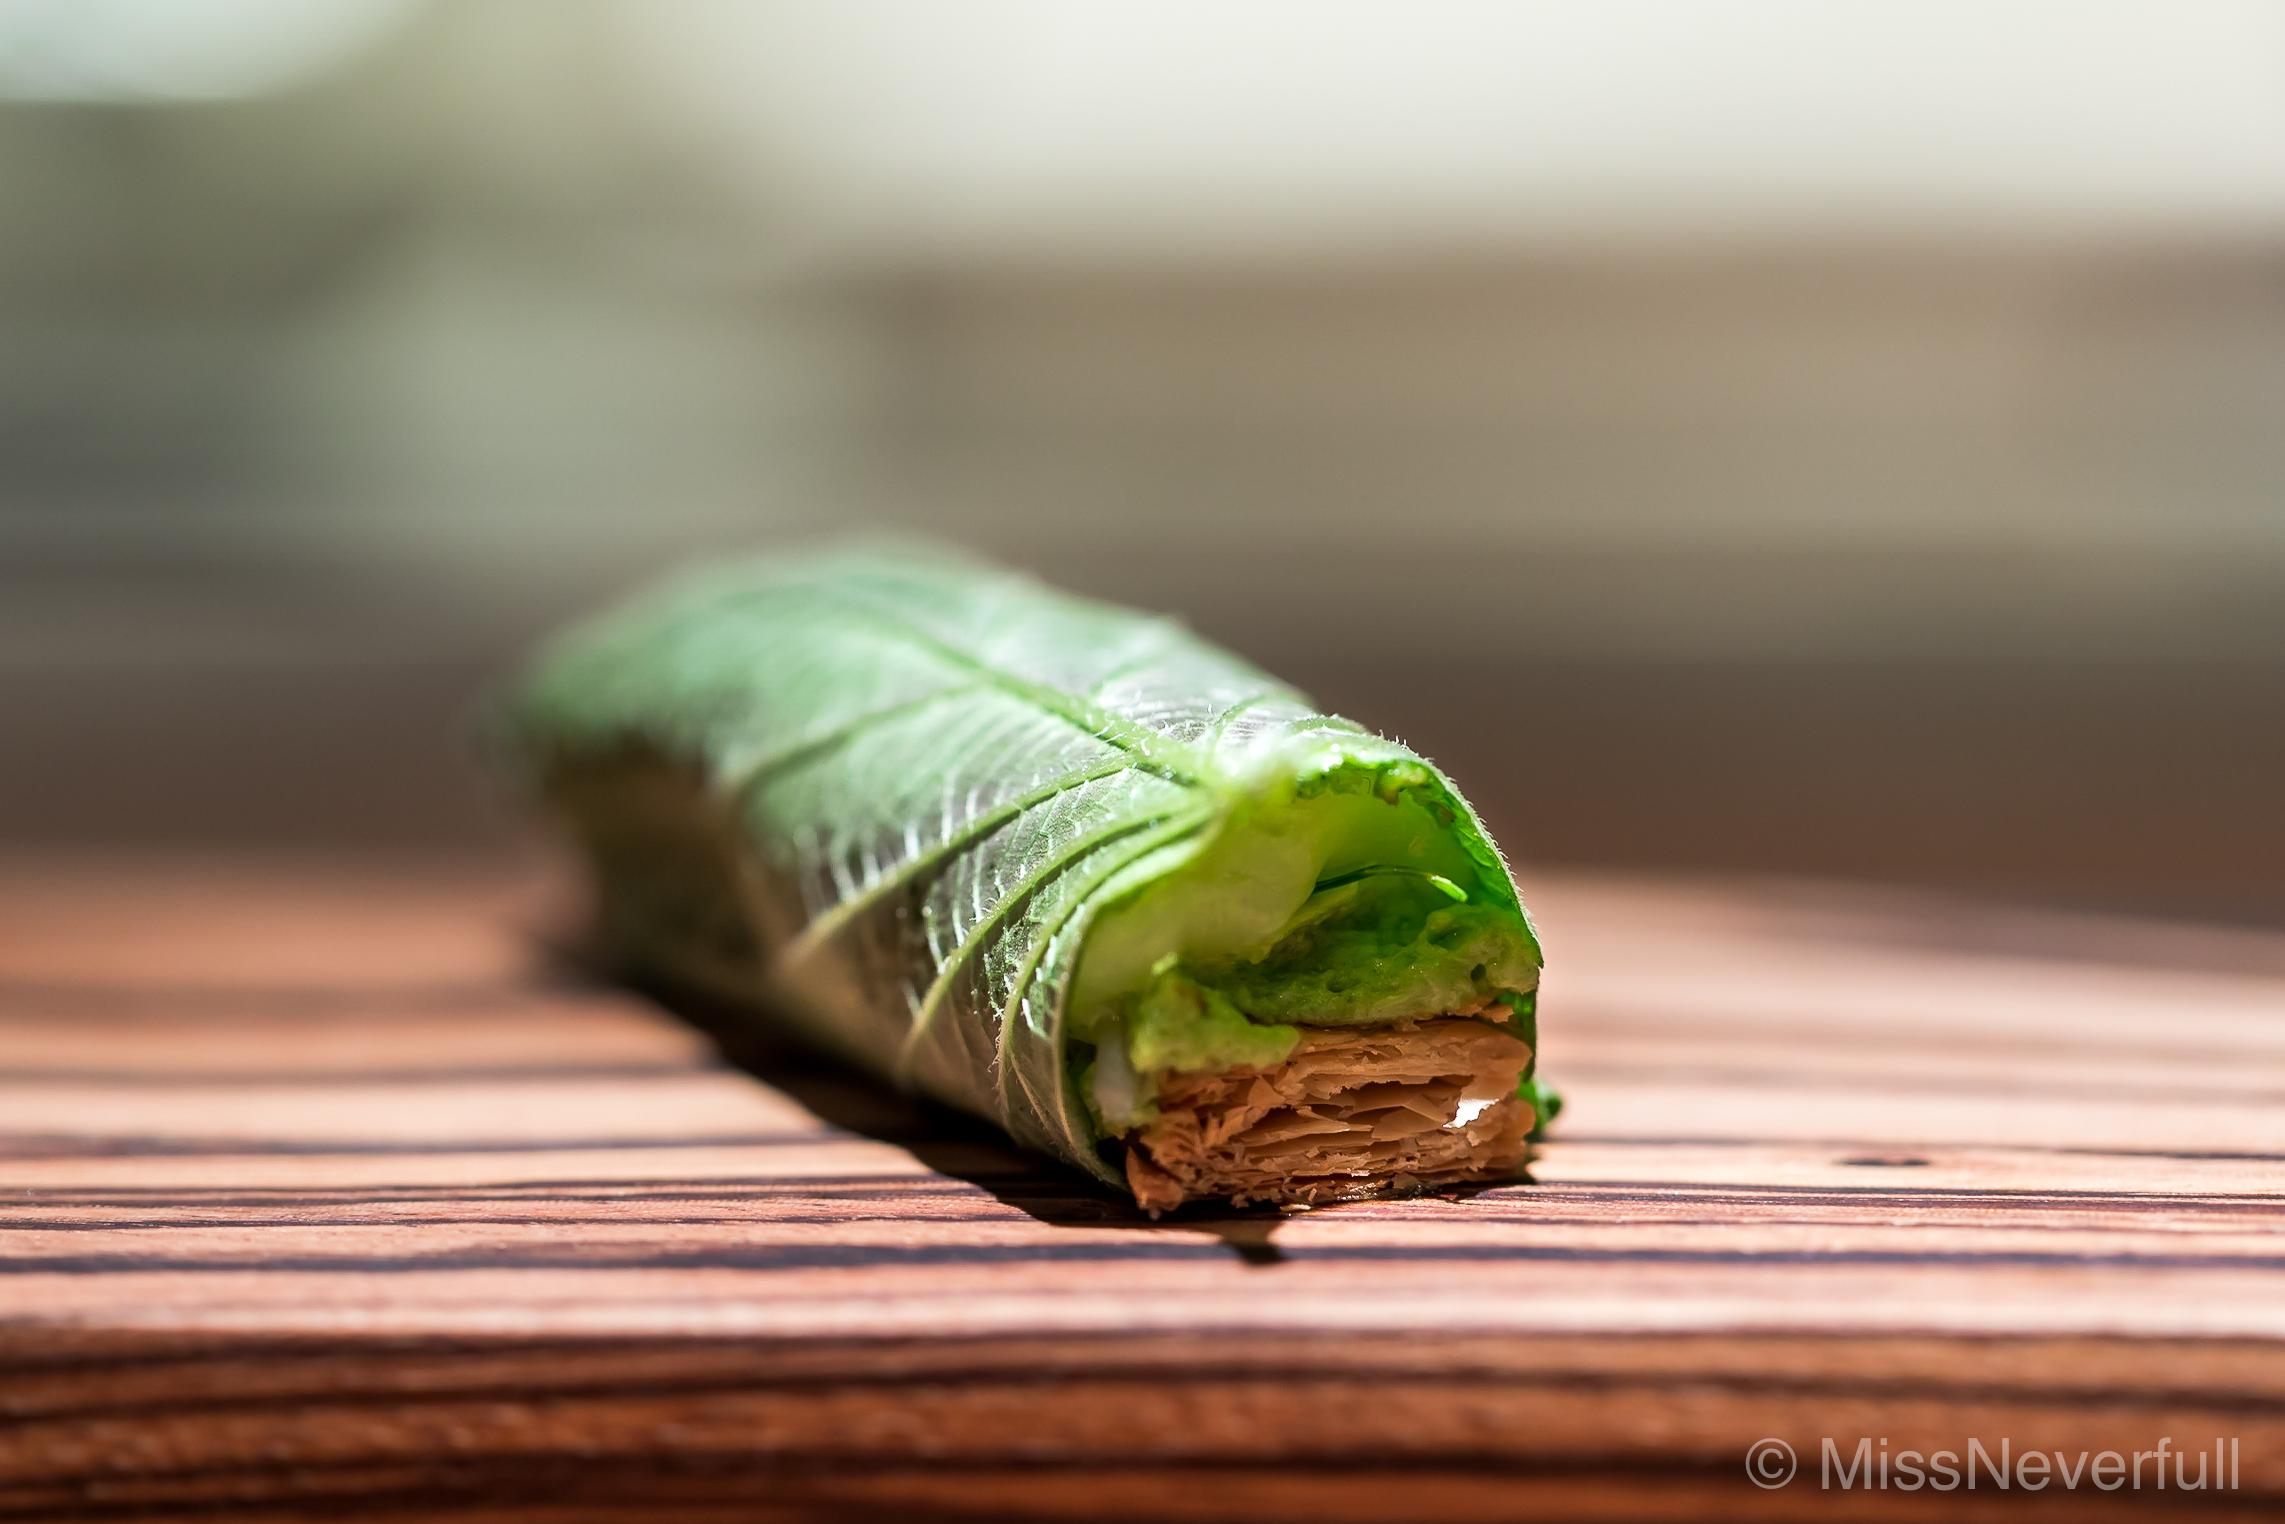 1. Scallops, Egoma (perilla)leaf, potato and parsley cream on mille feuille